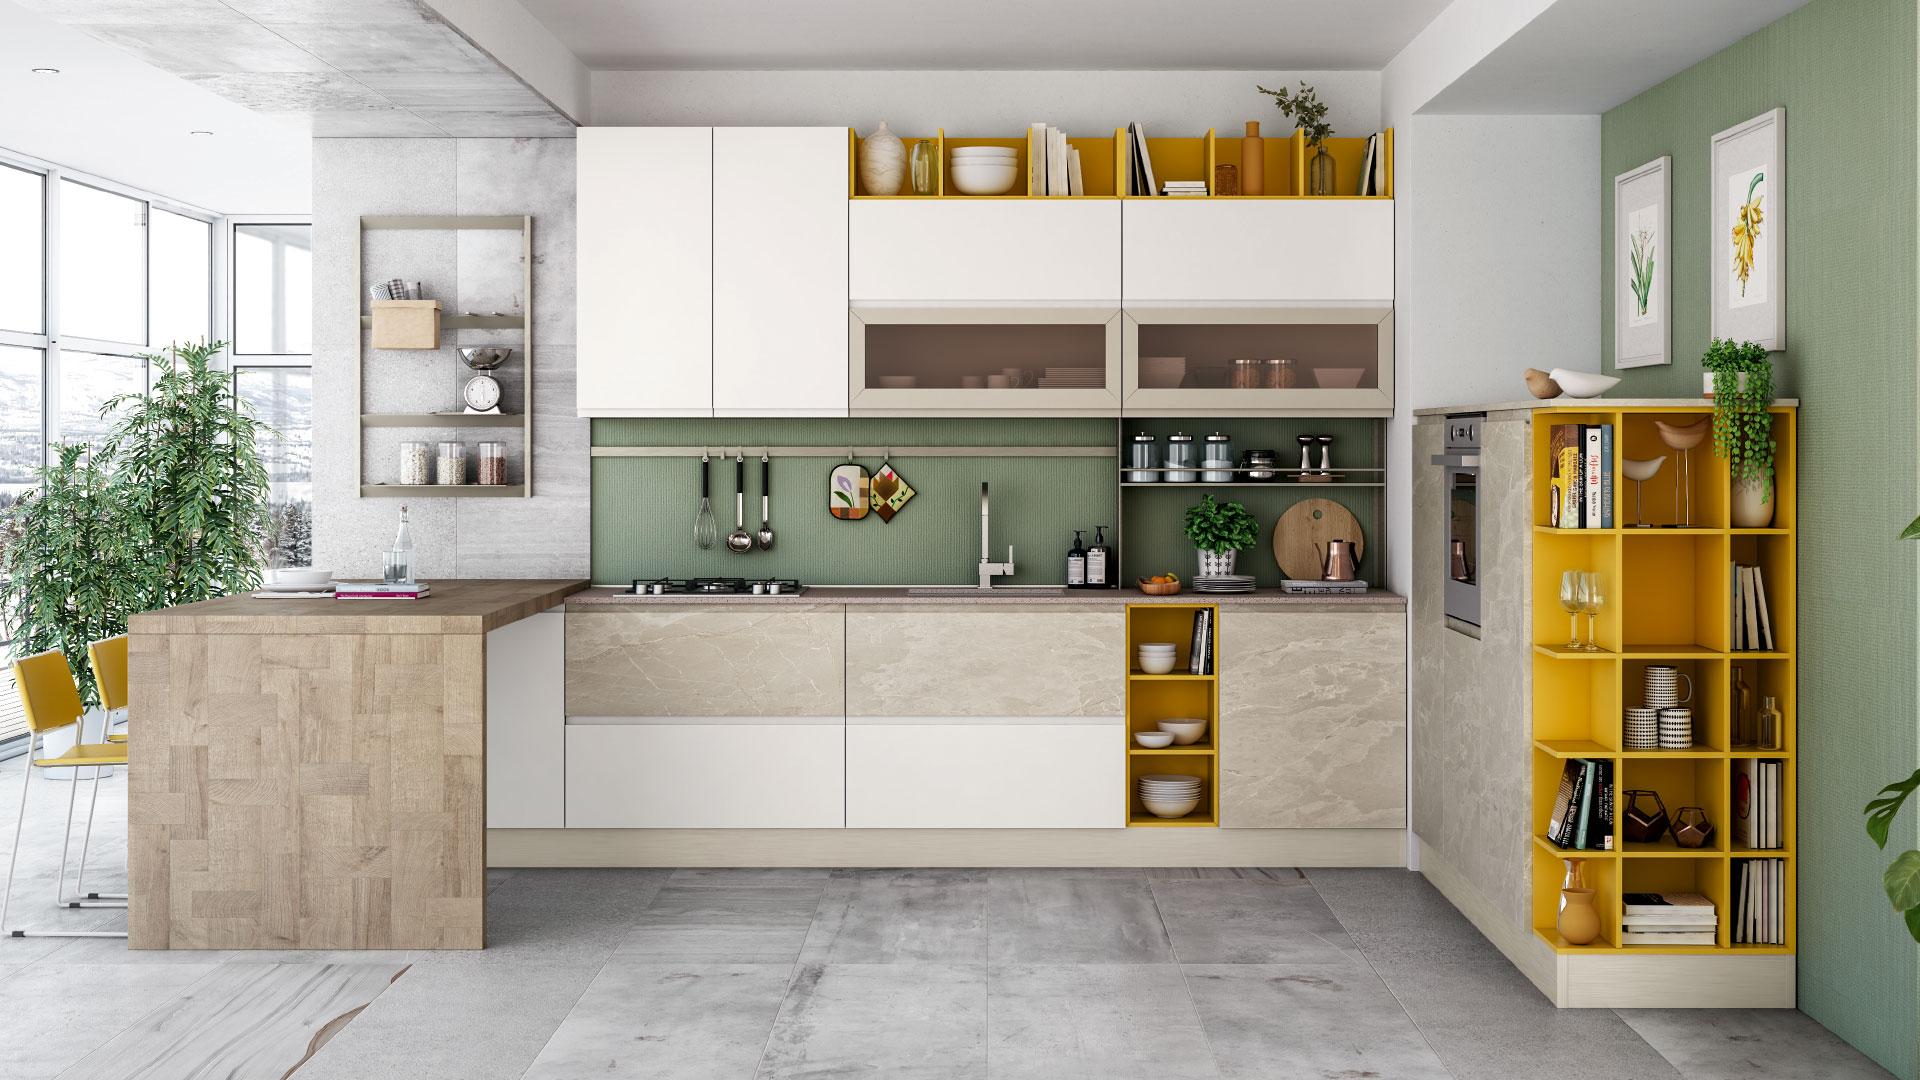 Ricambi Cucine Lube Napoli choose your kitchen - creo kitchens